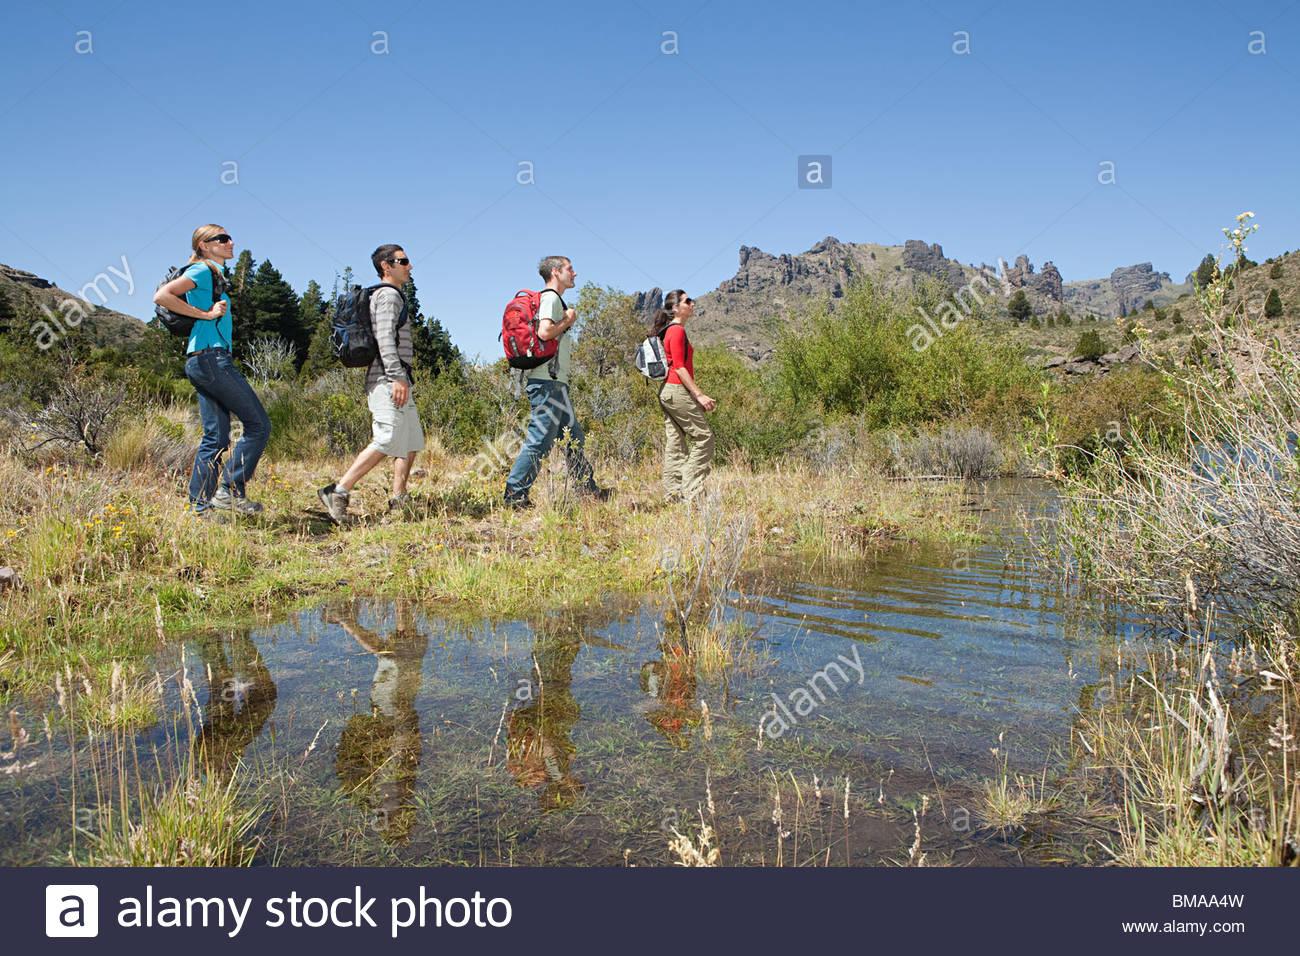 Hikers walking by lake - Stock Image